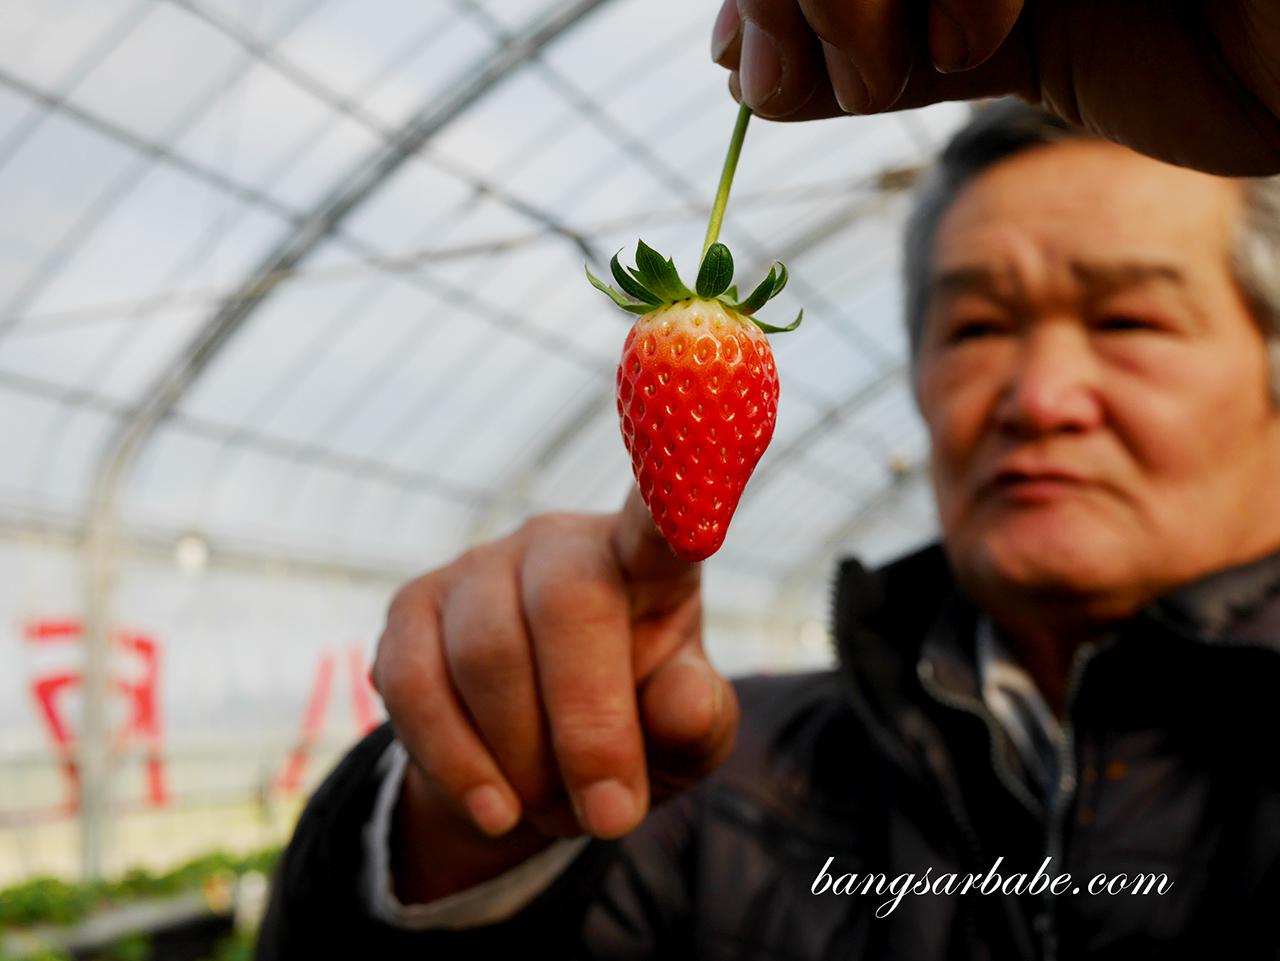 Mr. Yutaka Yasuda from Ichigo Farm